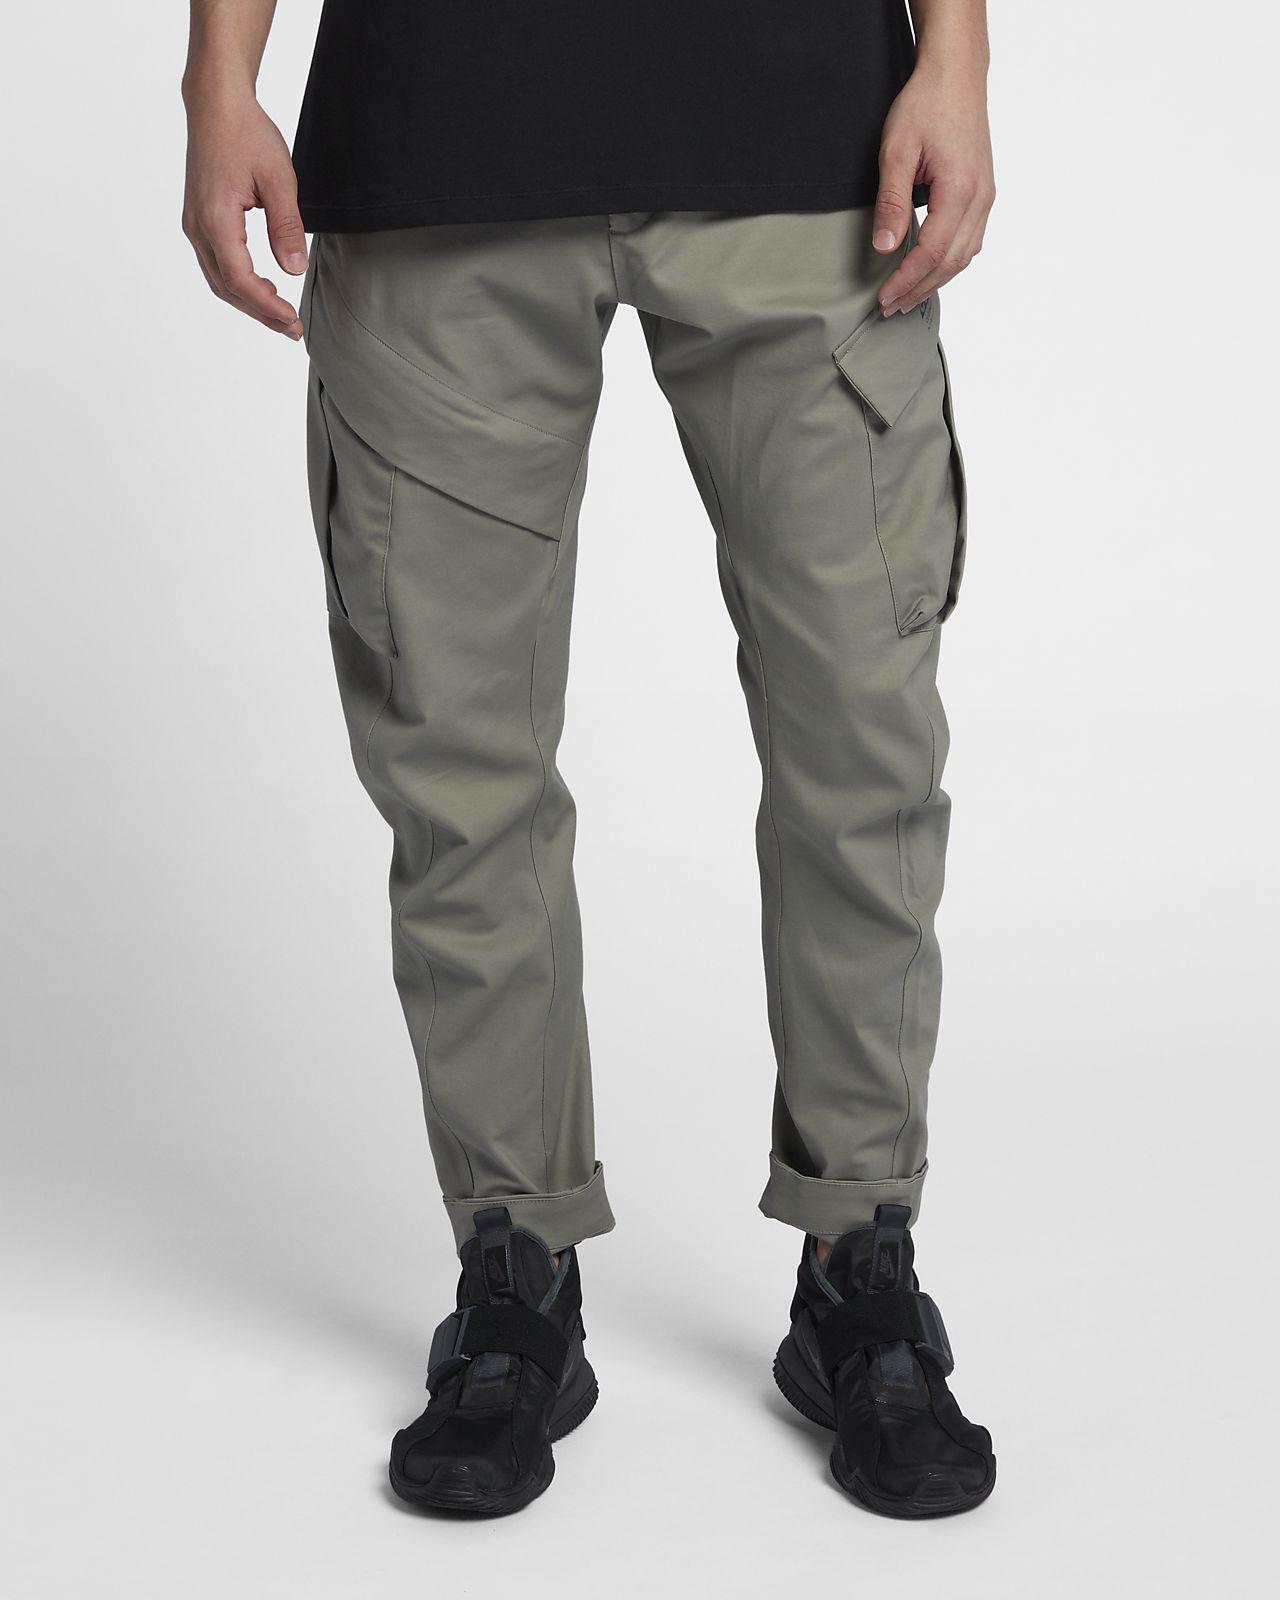 NikeLab ACG Cargo 男款運動褲